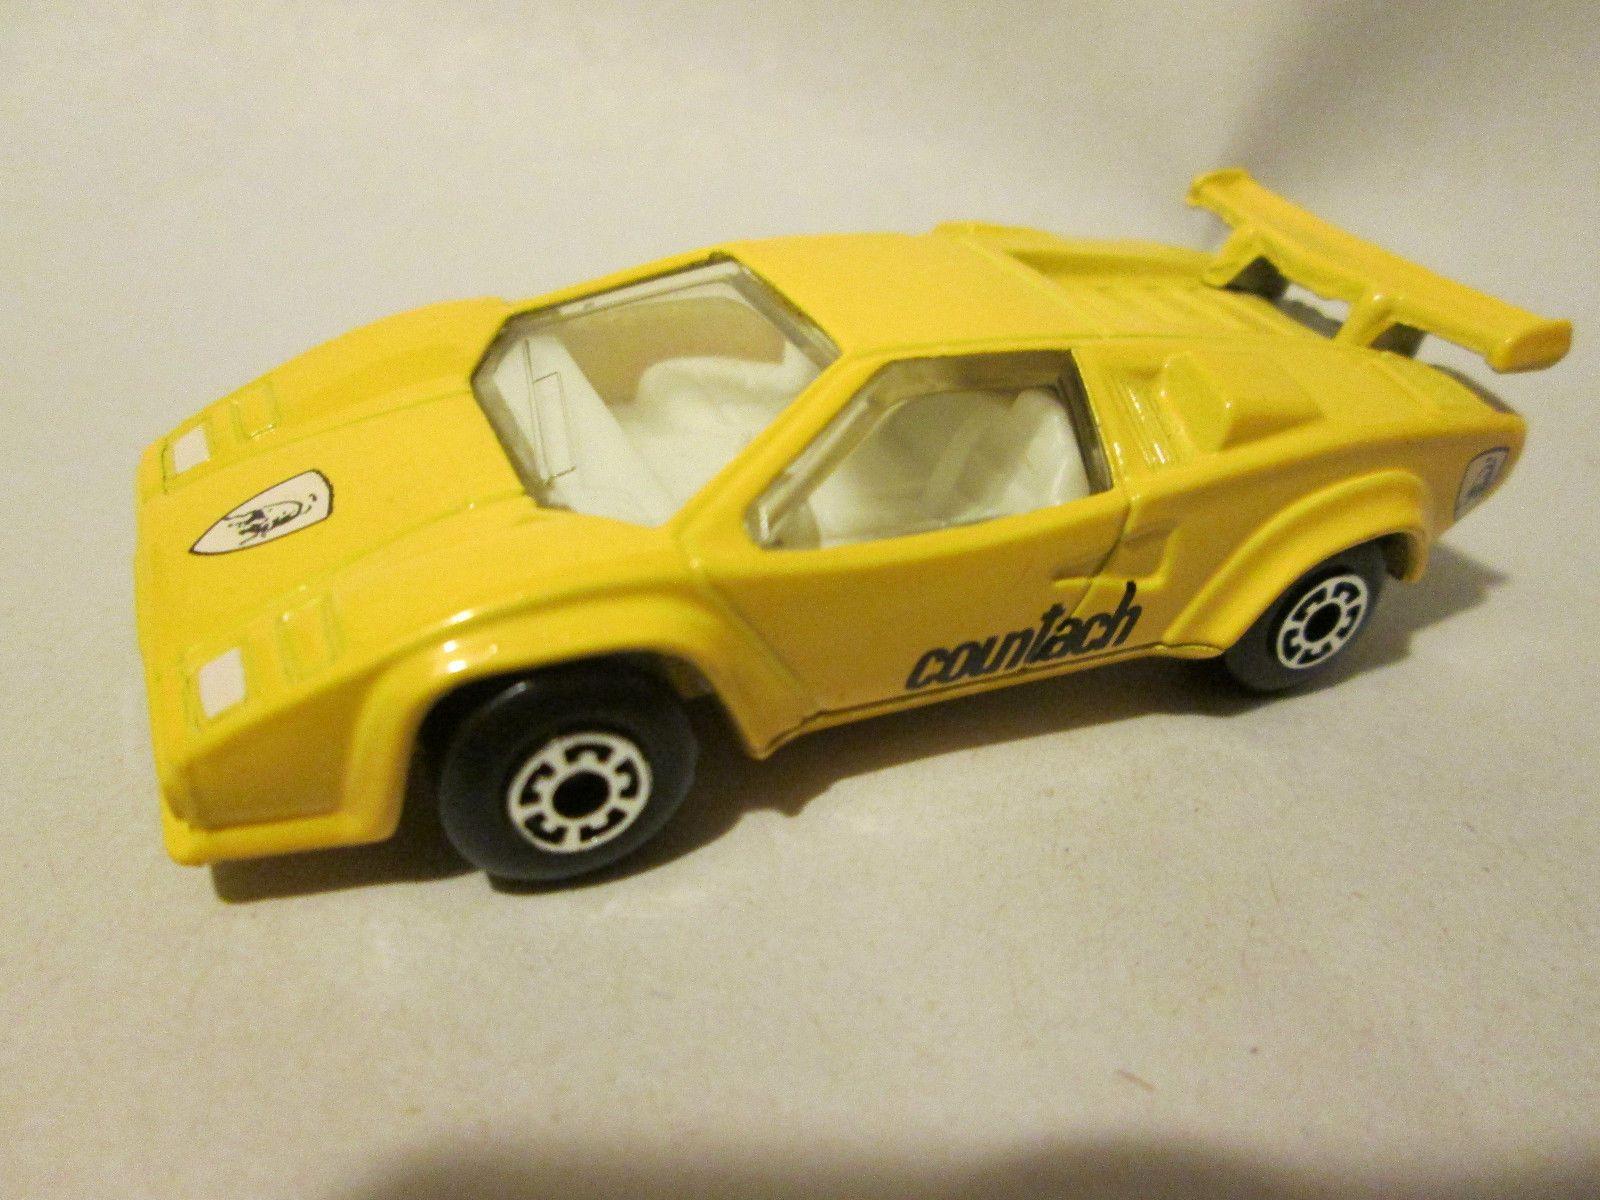 c37ac171fe6458edfdd7c2d5bdc85203 Breathtaking Lamborghini Countach Owners Manual Pdf Cars Trend